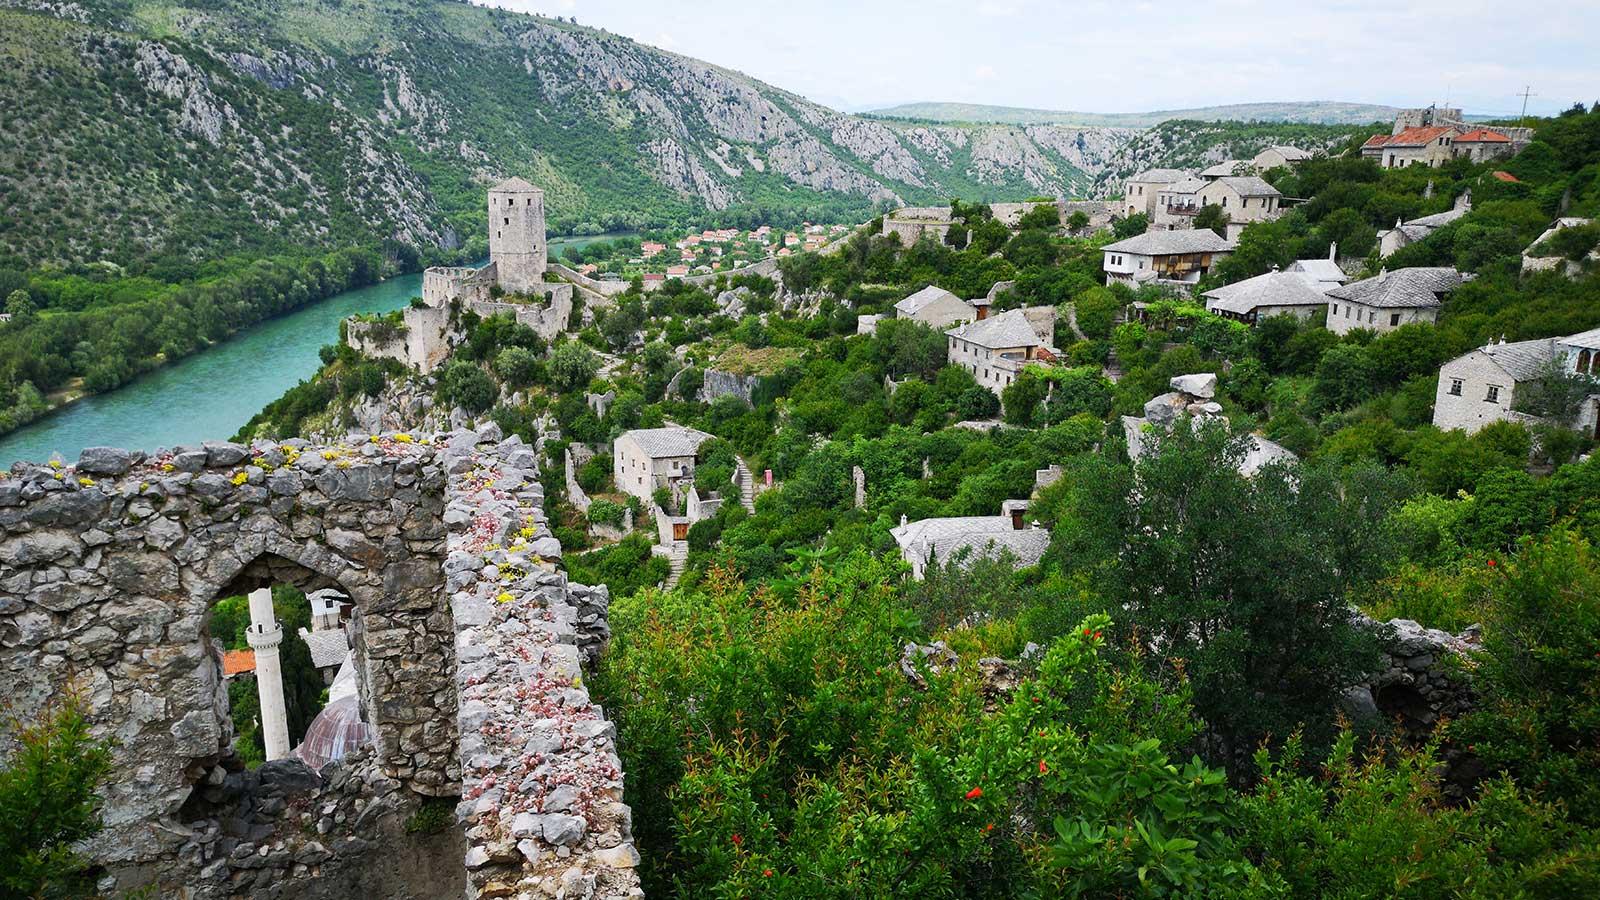 Balkan Entdeckungsreise Kroatein Montenegro Bosnien Herzegowina Serbien Ungarn Gruppenreisen Europa traveljunkies